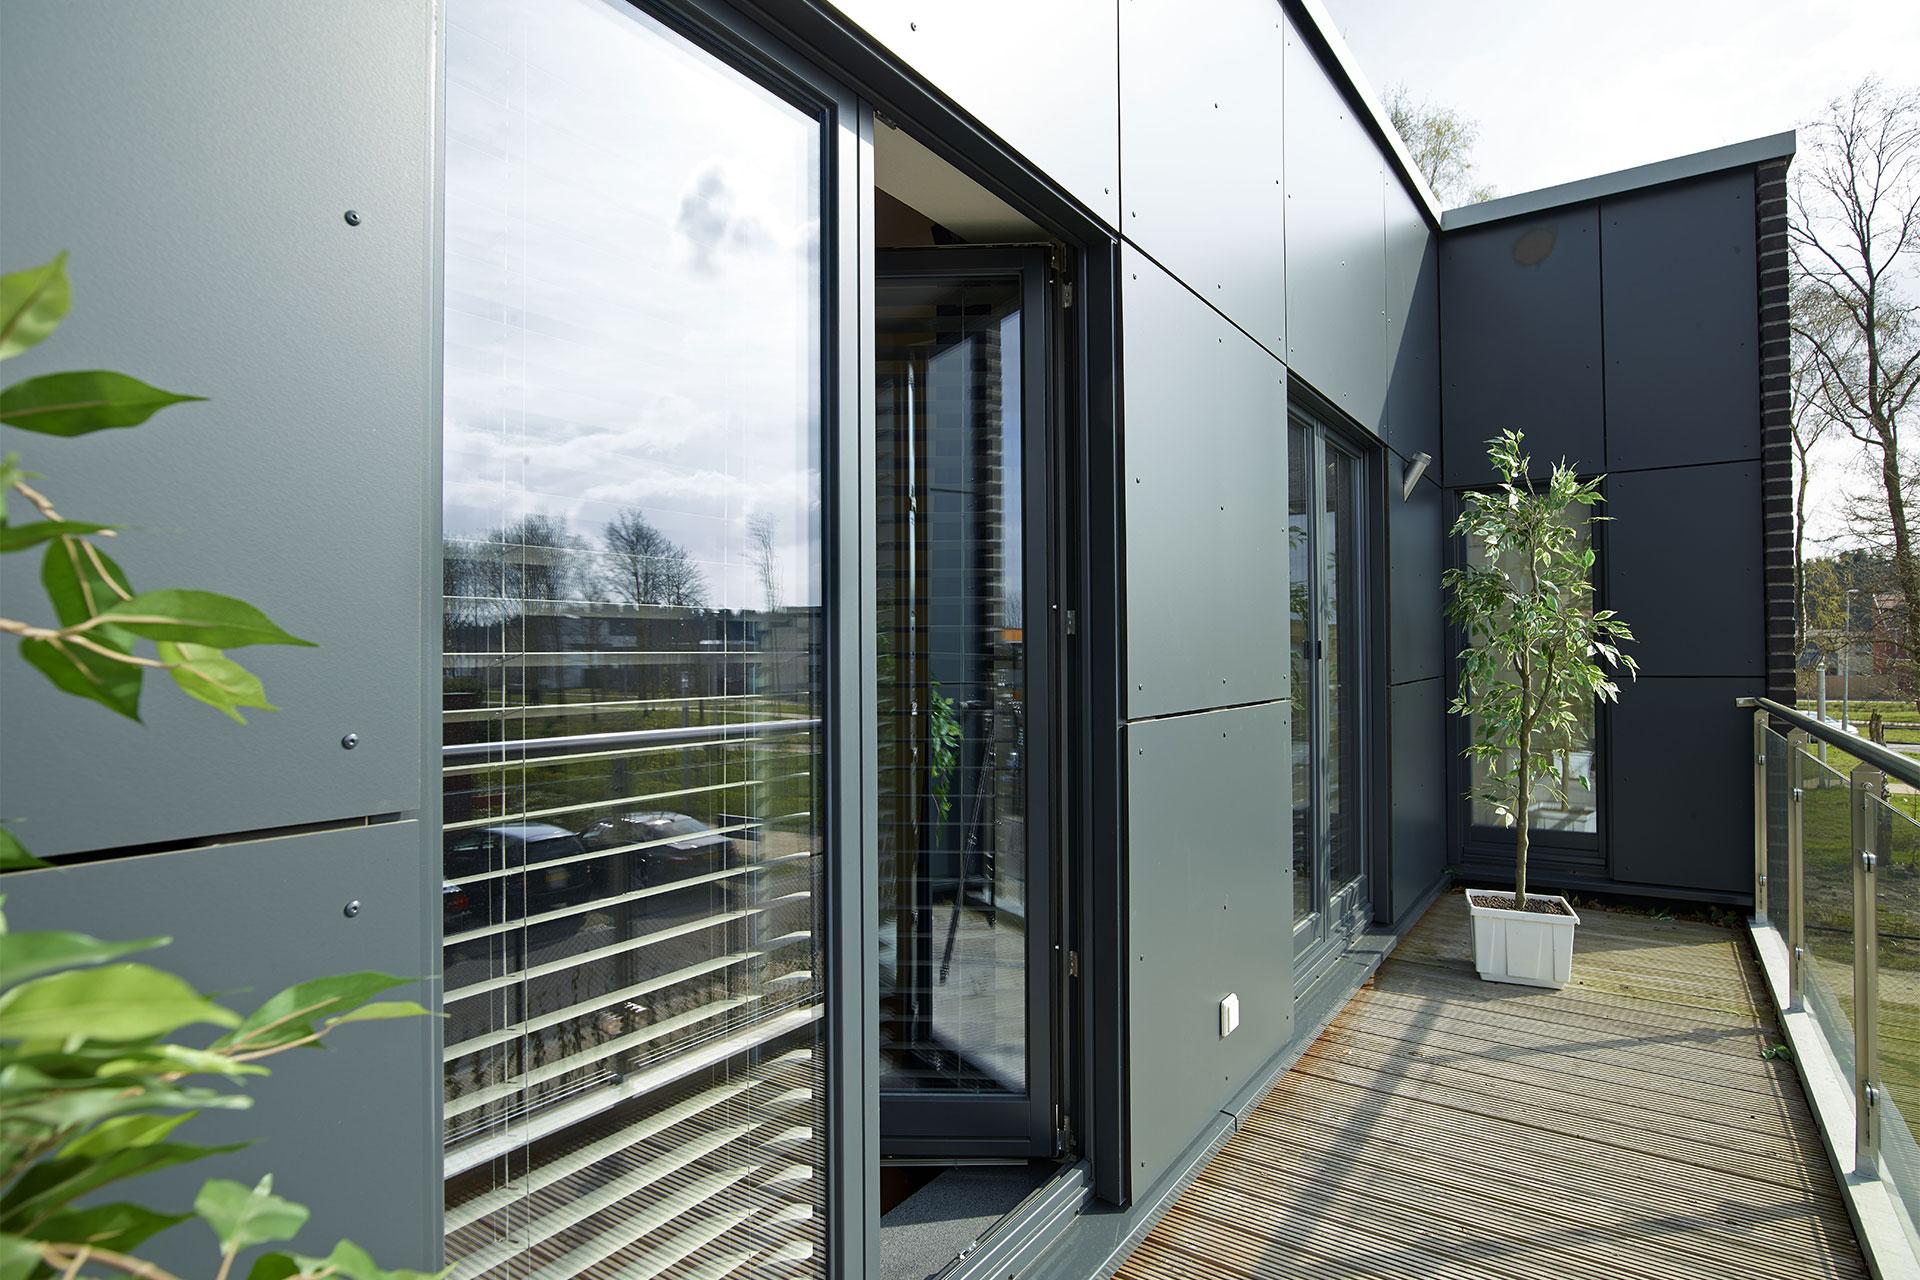 Fertighaus klinker perfect moderne fertighaus stadtvilla for Klinkerhaus modern